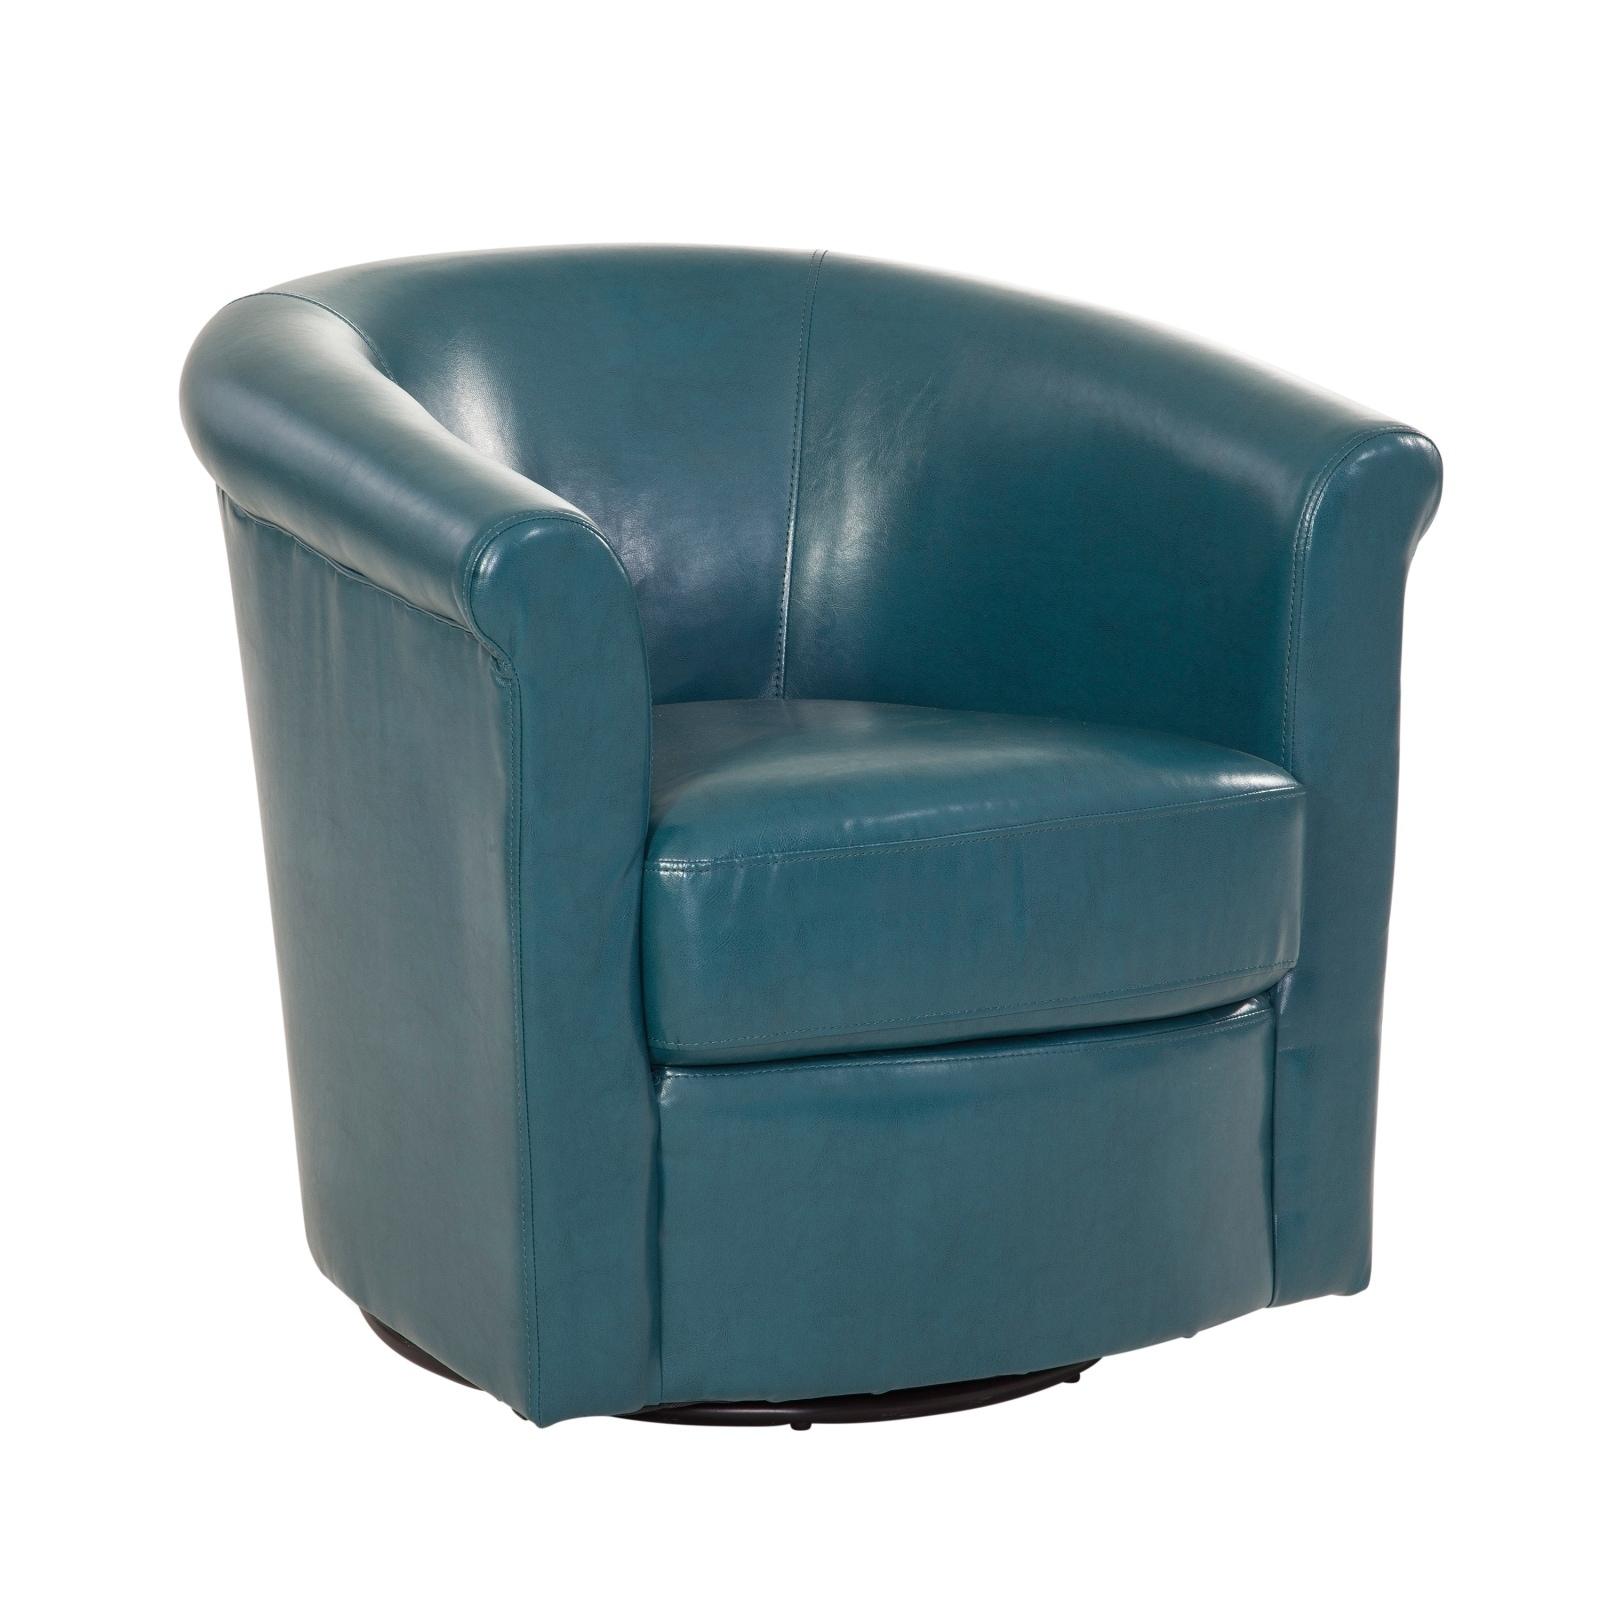 Marvel Swivel Tub Chair | eBay